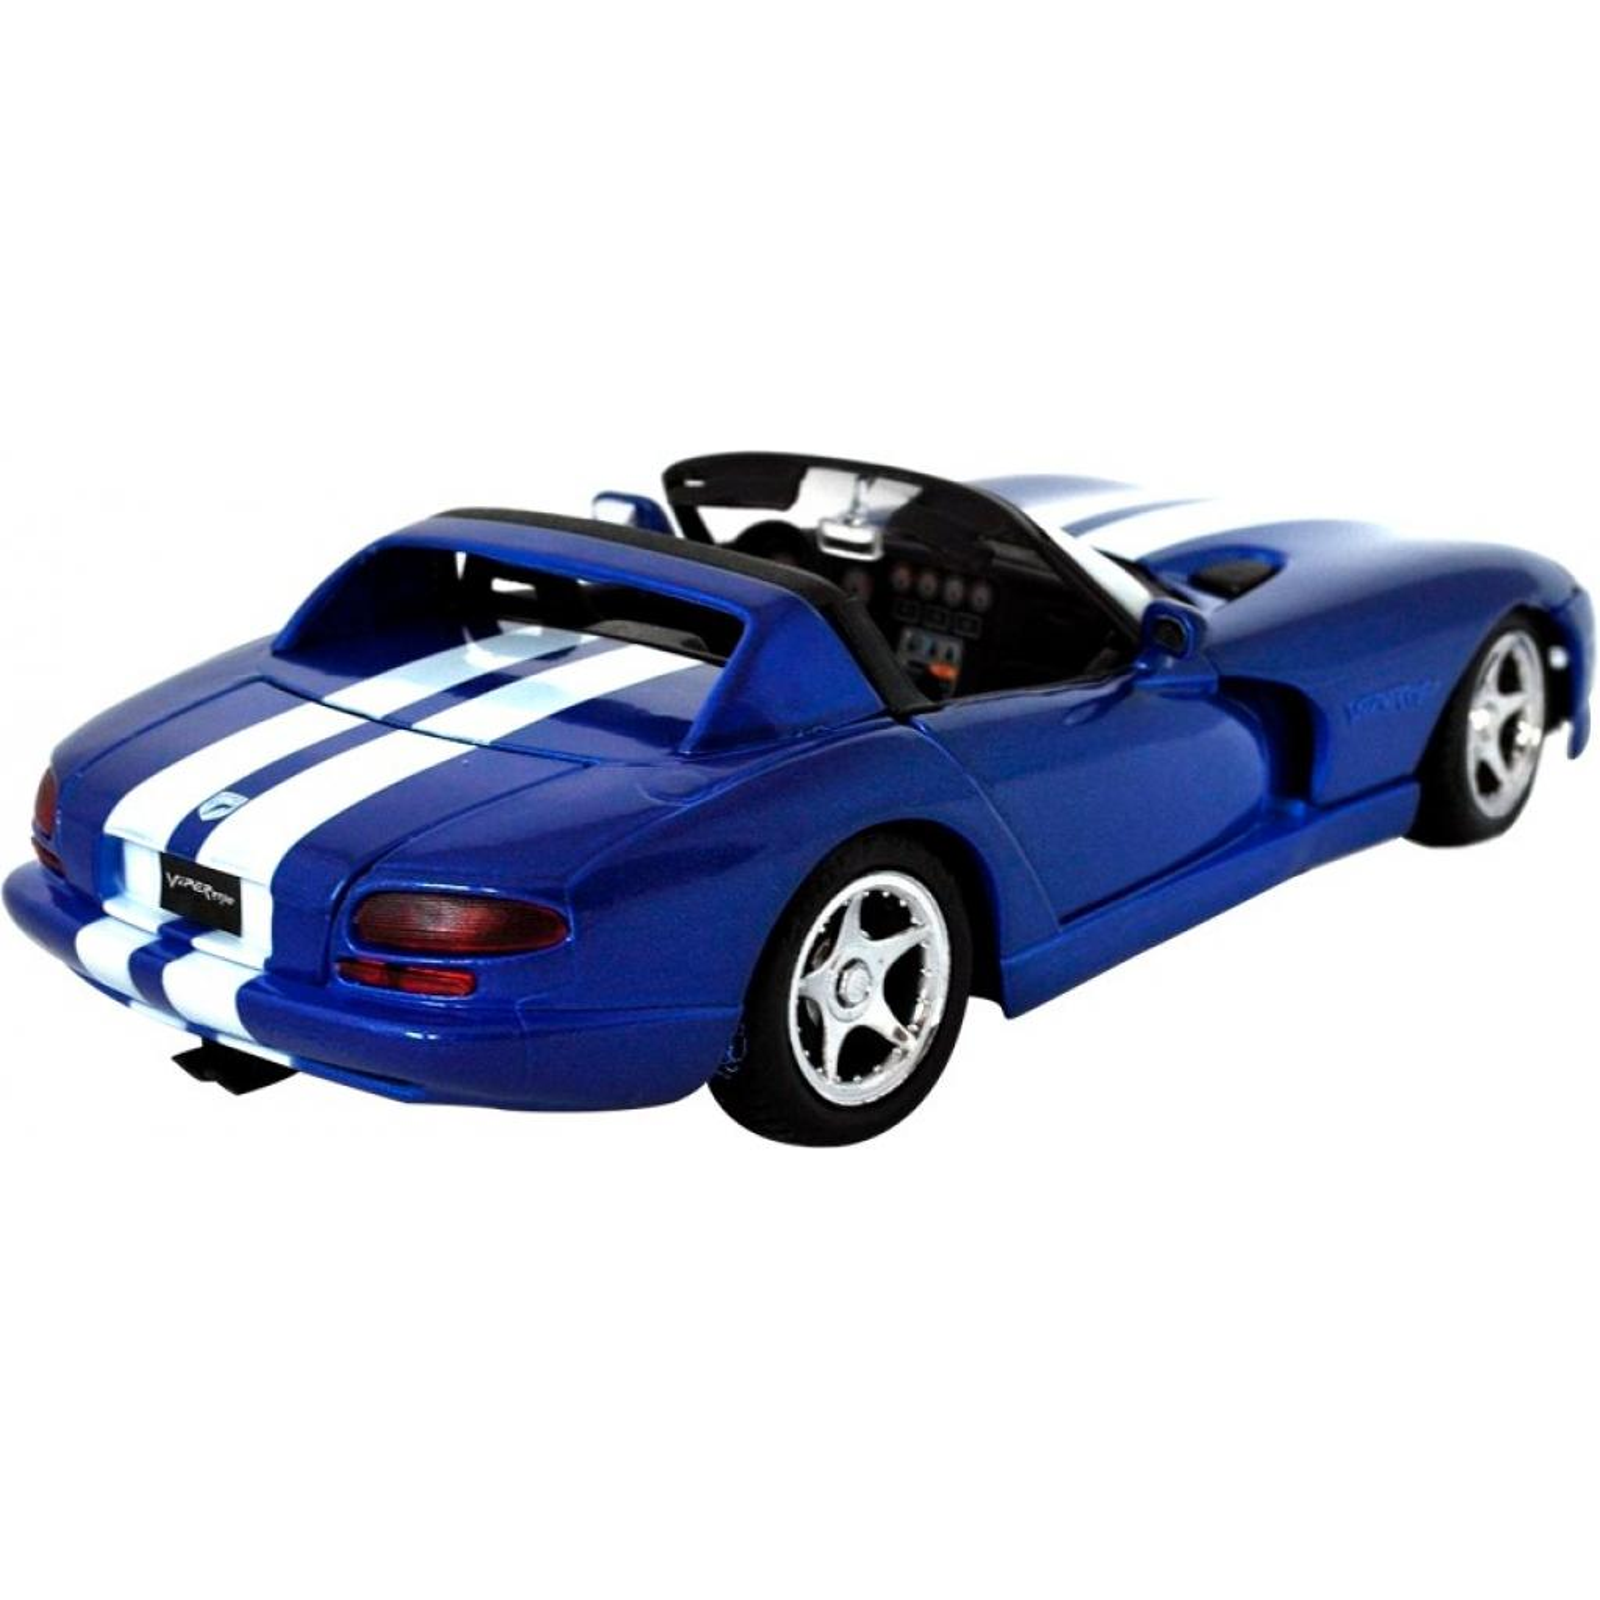 Машина Maisto Dodge Viper RT/10 '97 (1:24) синий (31932 blue) изображение 2